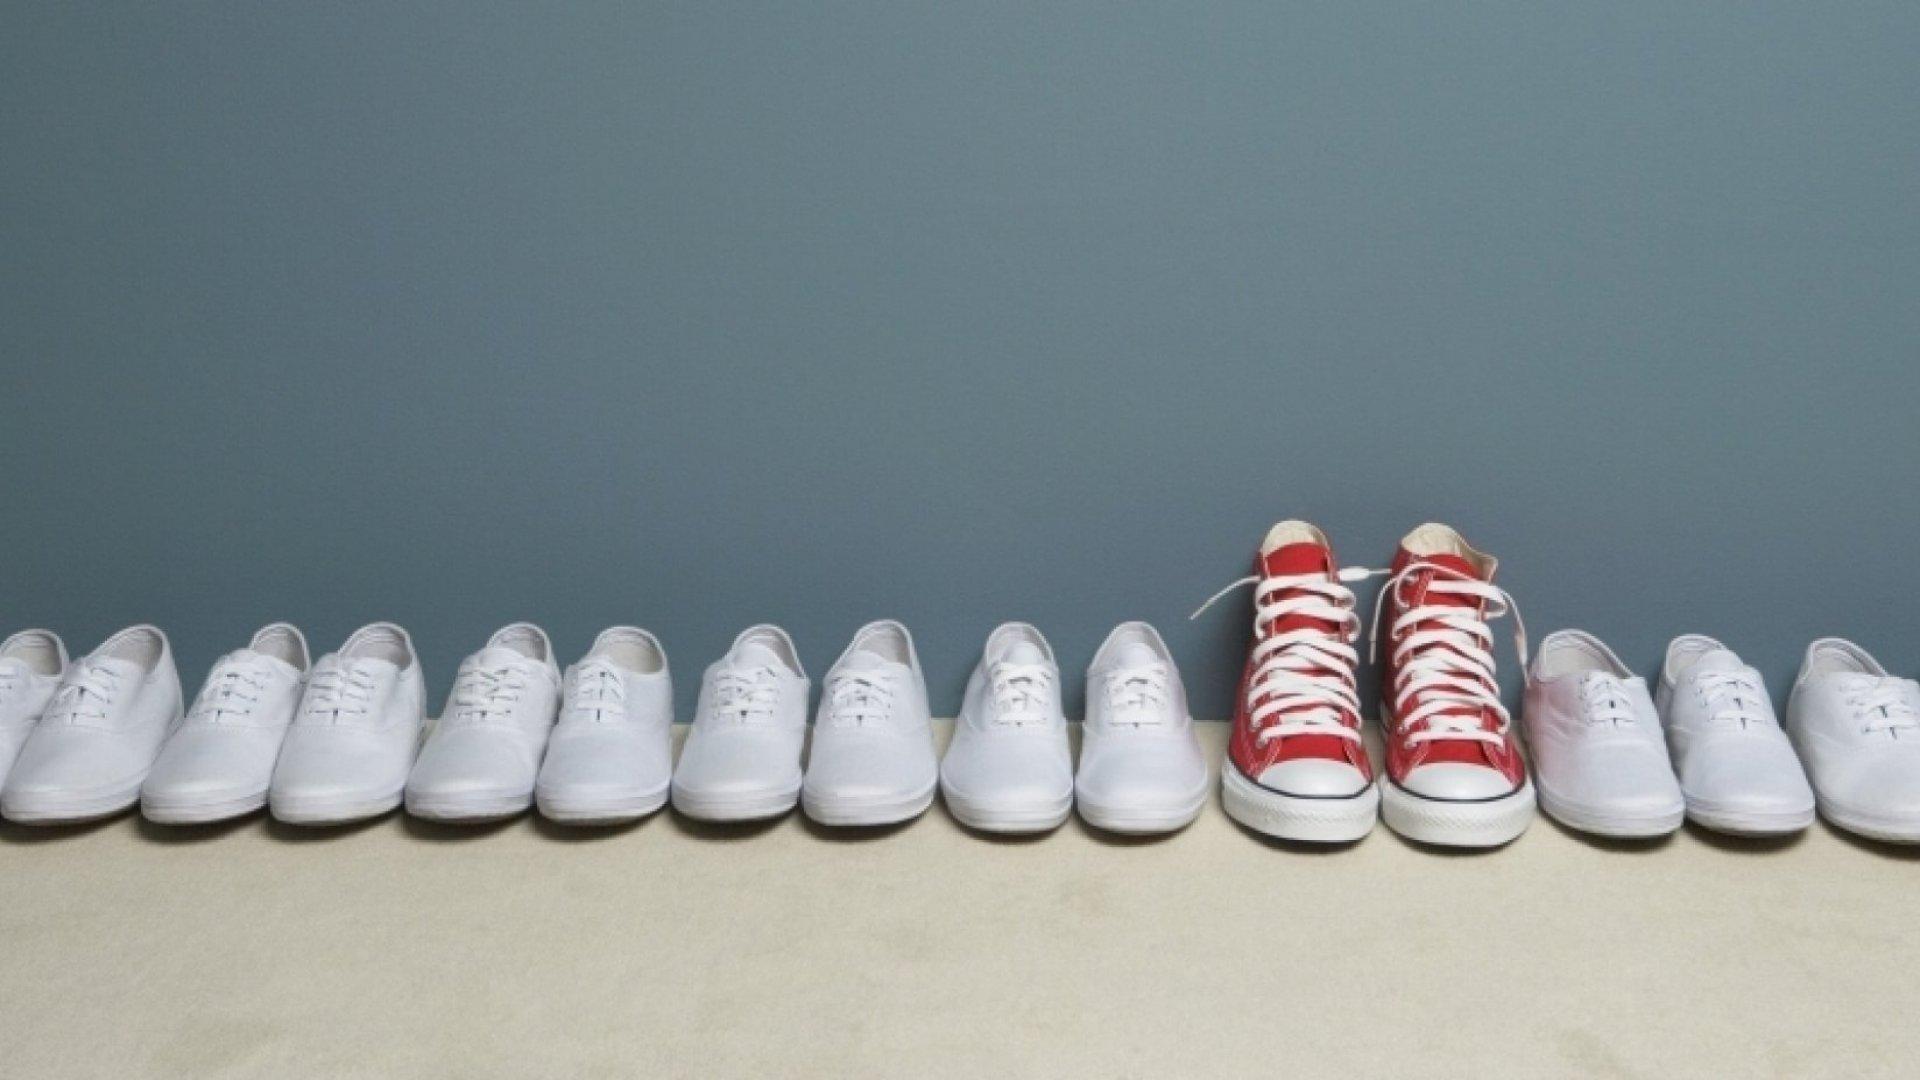 5 Simple Ways to Raise Your Company's Diversity Quotient